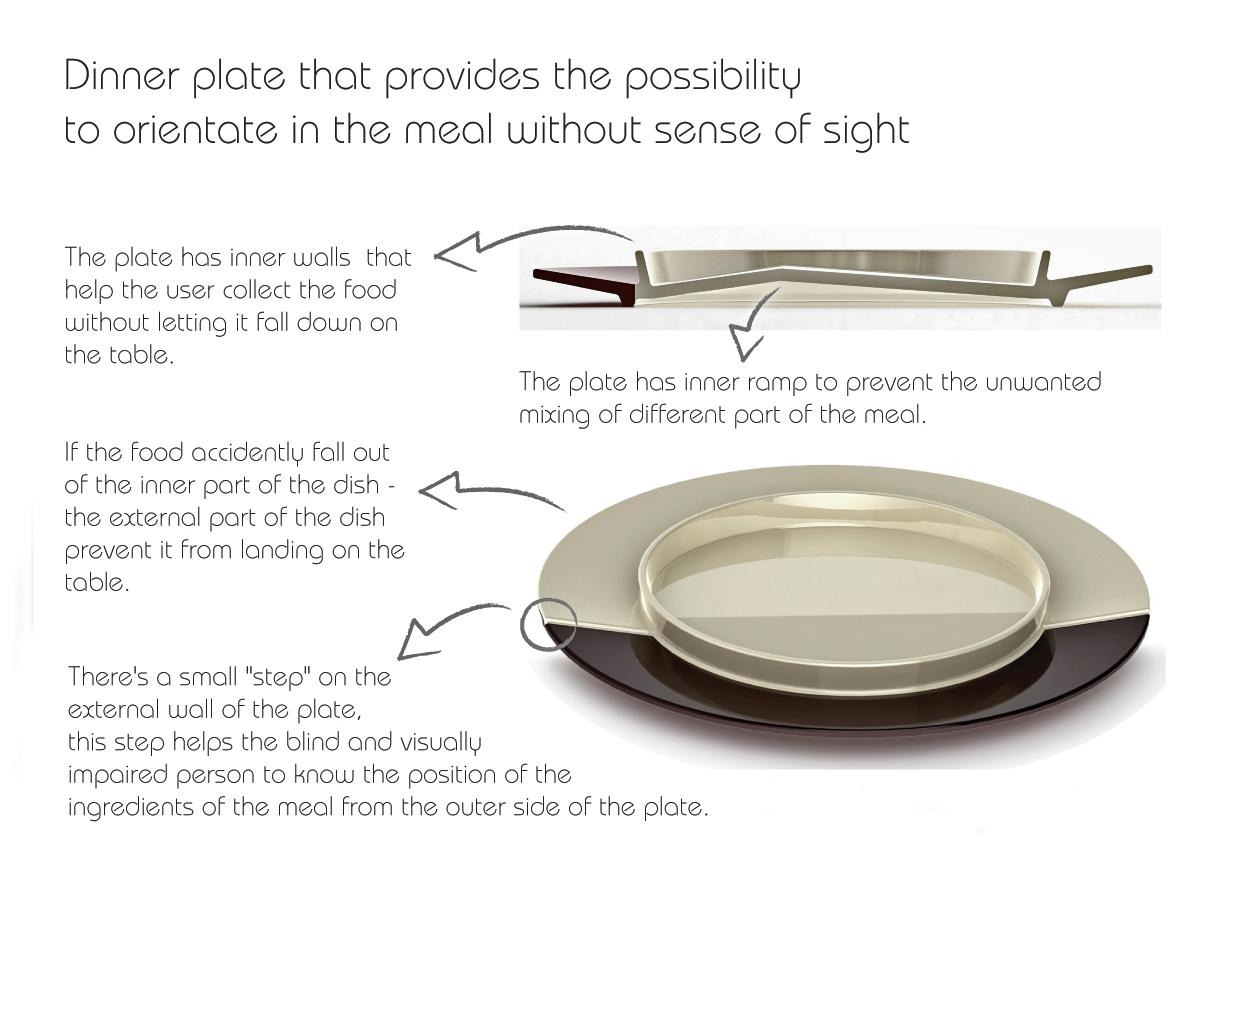 Oriento Dinner Plate